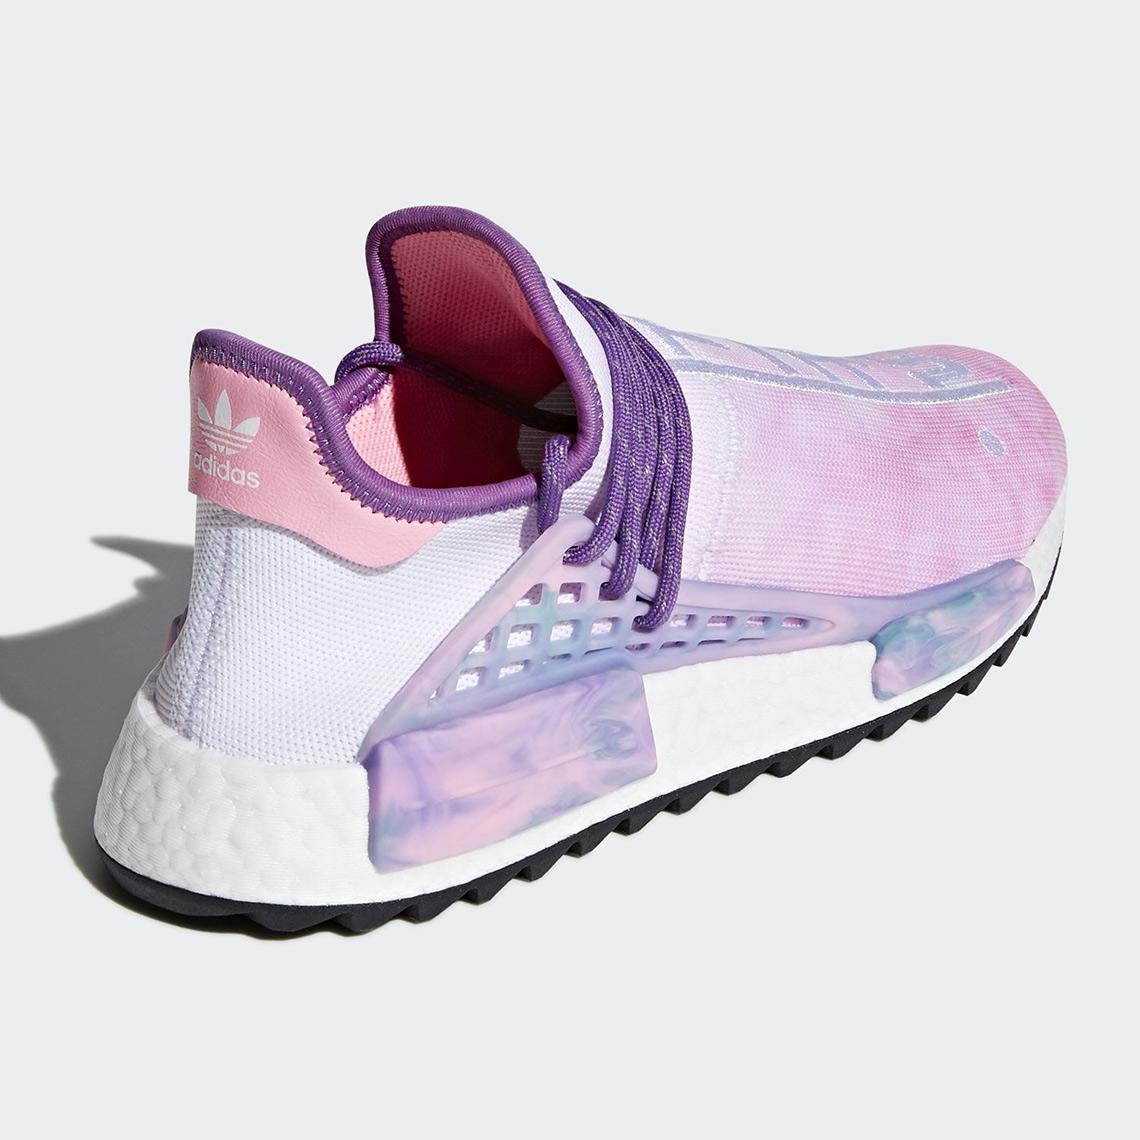 adidas pharrell holi nmd- OFF 50% - www